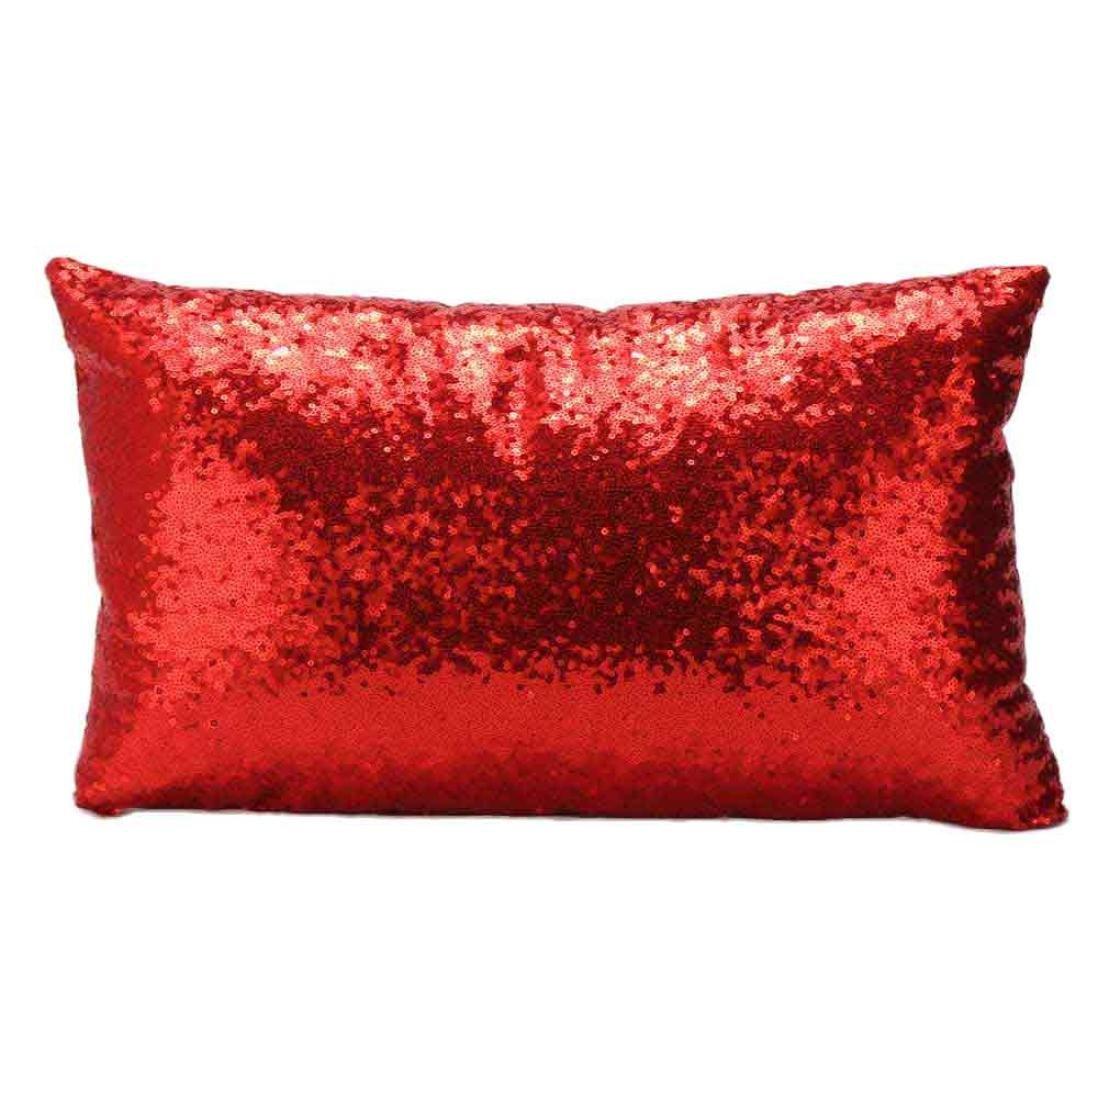 Rectangle Pillowcase, Kingko® Solid Color Glitter Sequins Throw Pillow Case Cafe Home Festival Decor Car Sofa Cushion Covers (Pink) VBPAAZUKZINL3862